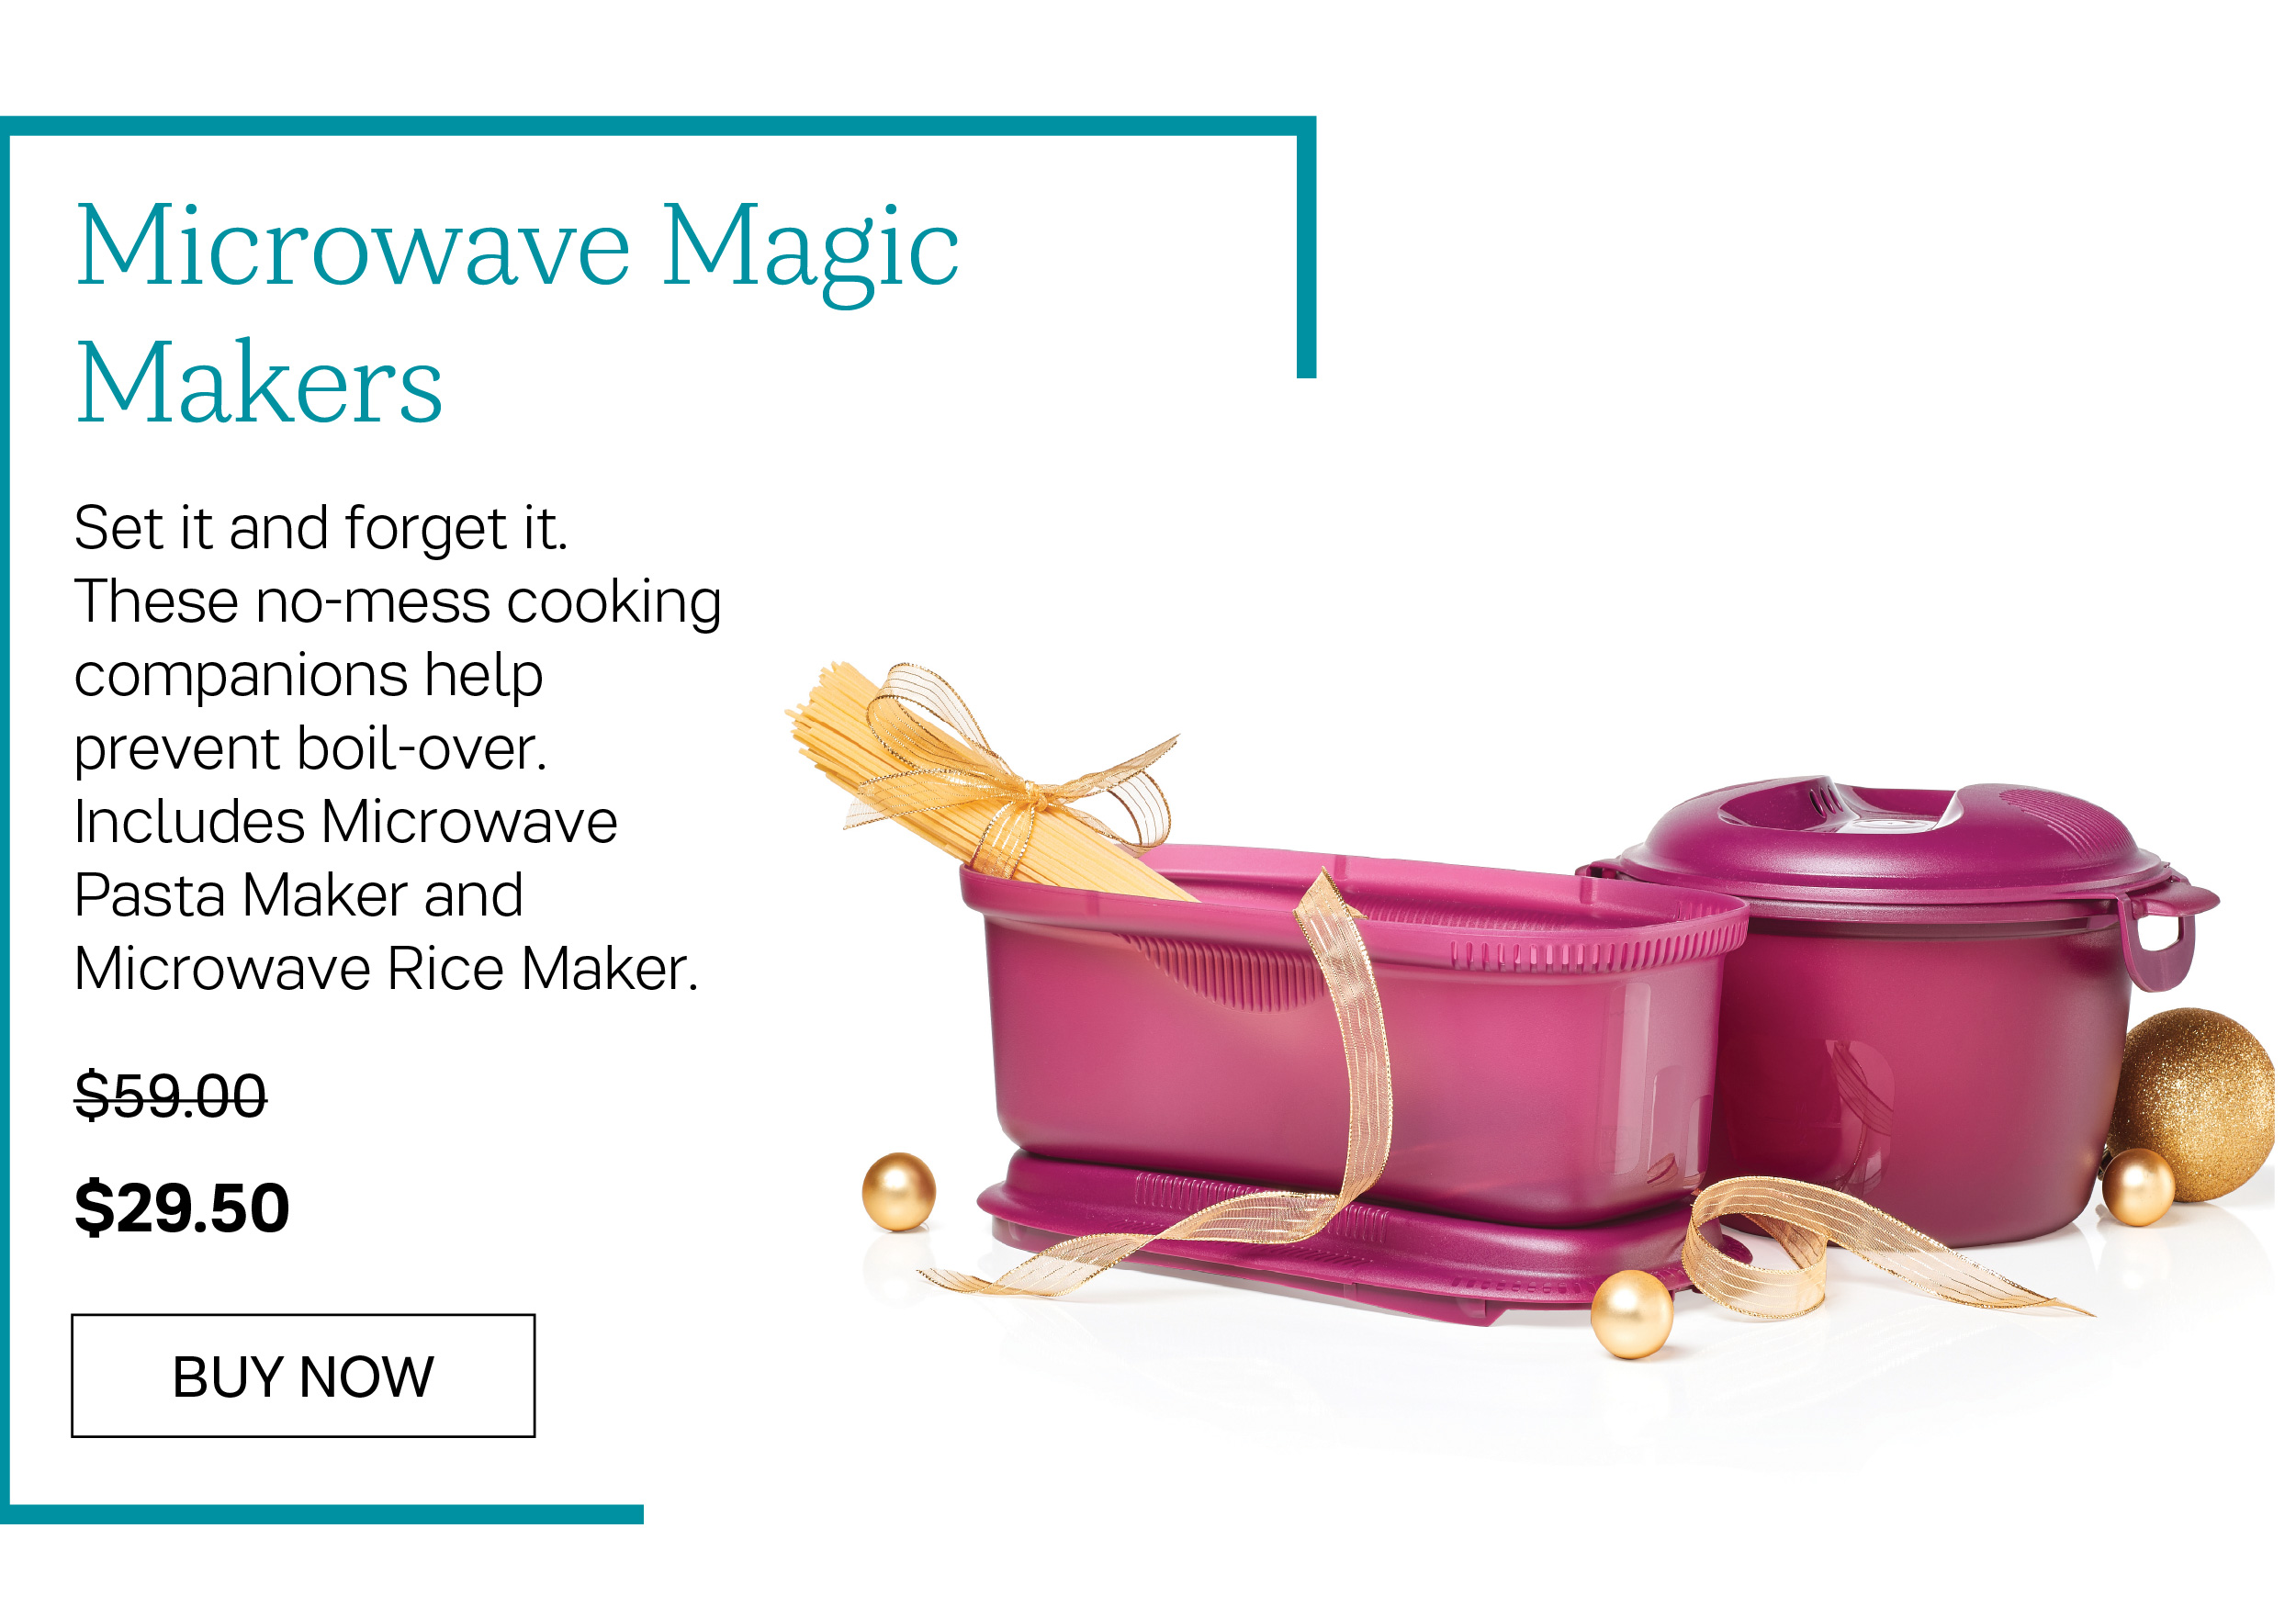 Microwave Magic Makers